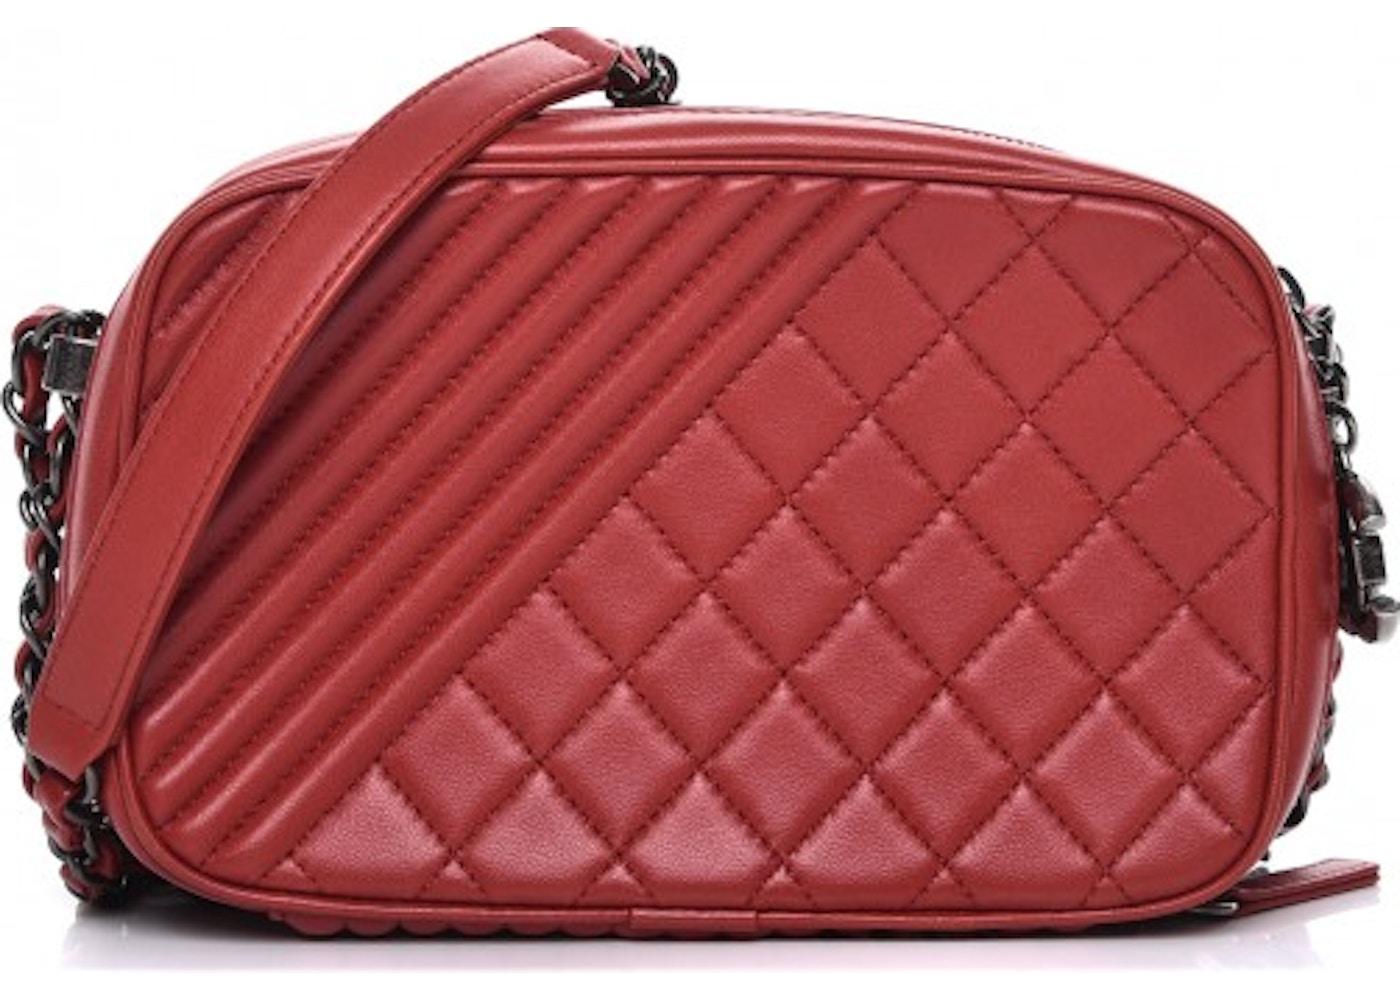 d0c5cf92ed2faa Chanel Coco Boy Camera Case Quilted Diamond Small Red. Quilted Diamond  Small Red